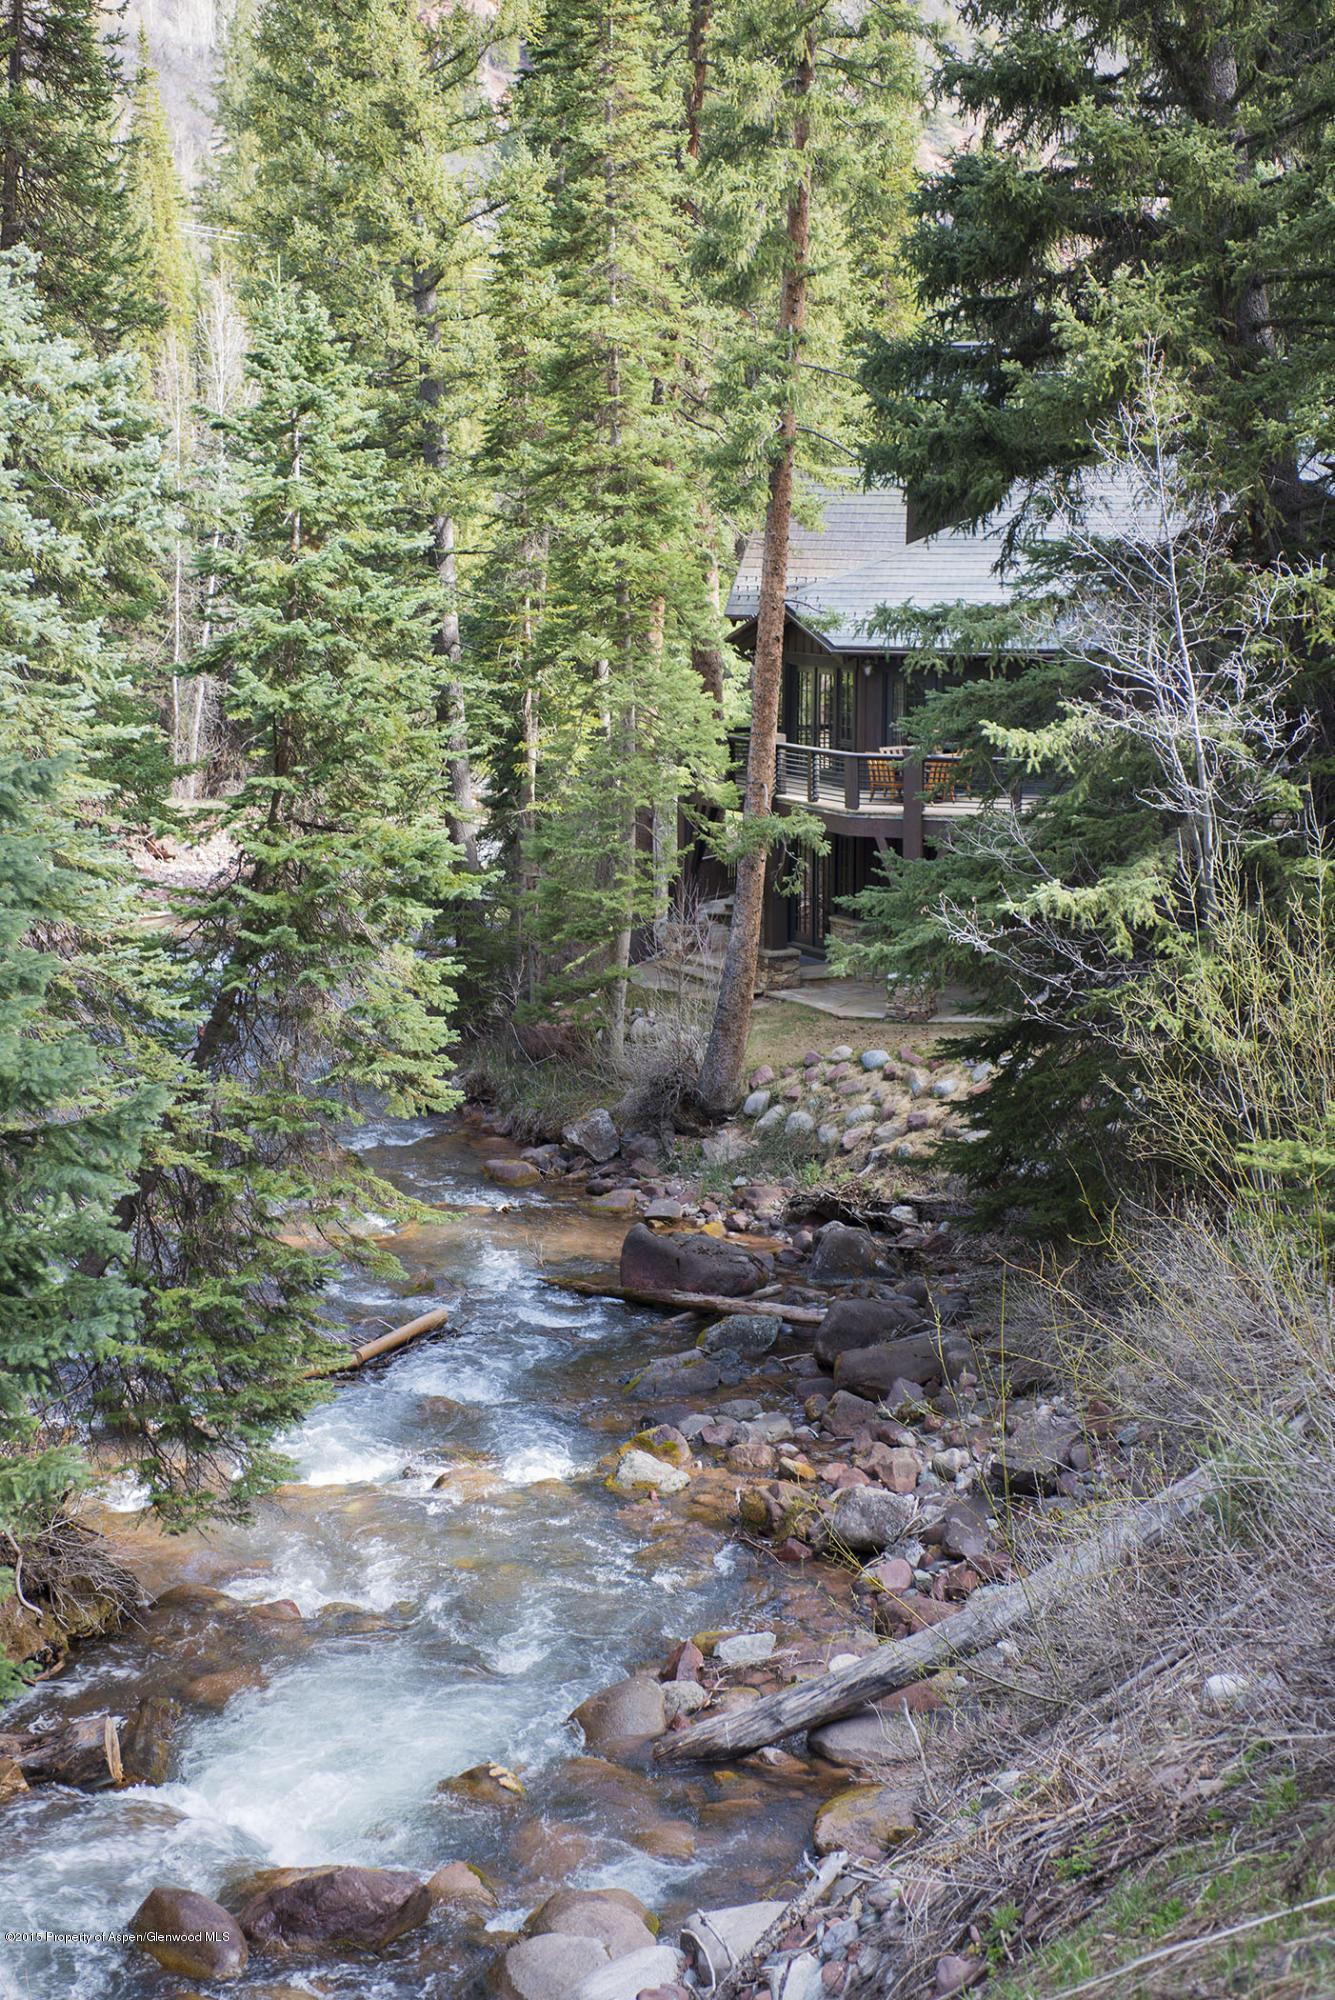 1819 Maroon Creek Road, Aspen, CO | MLS# 138705 | Aspen Real